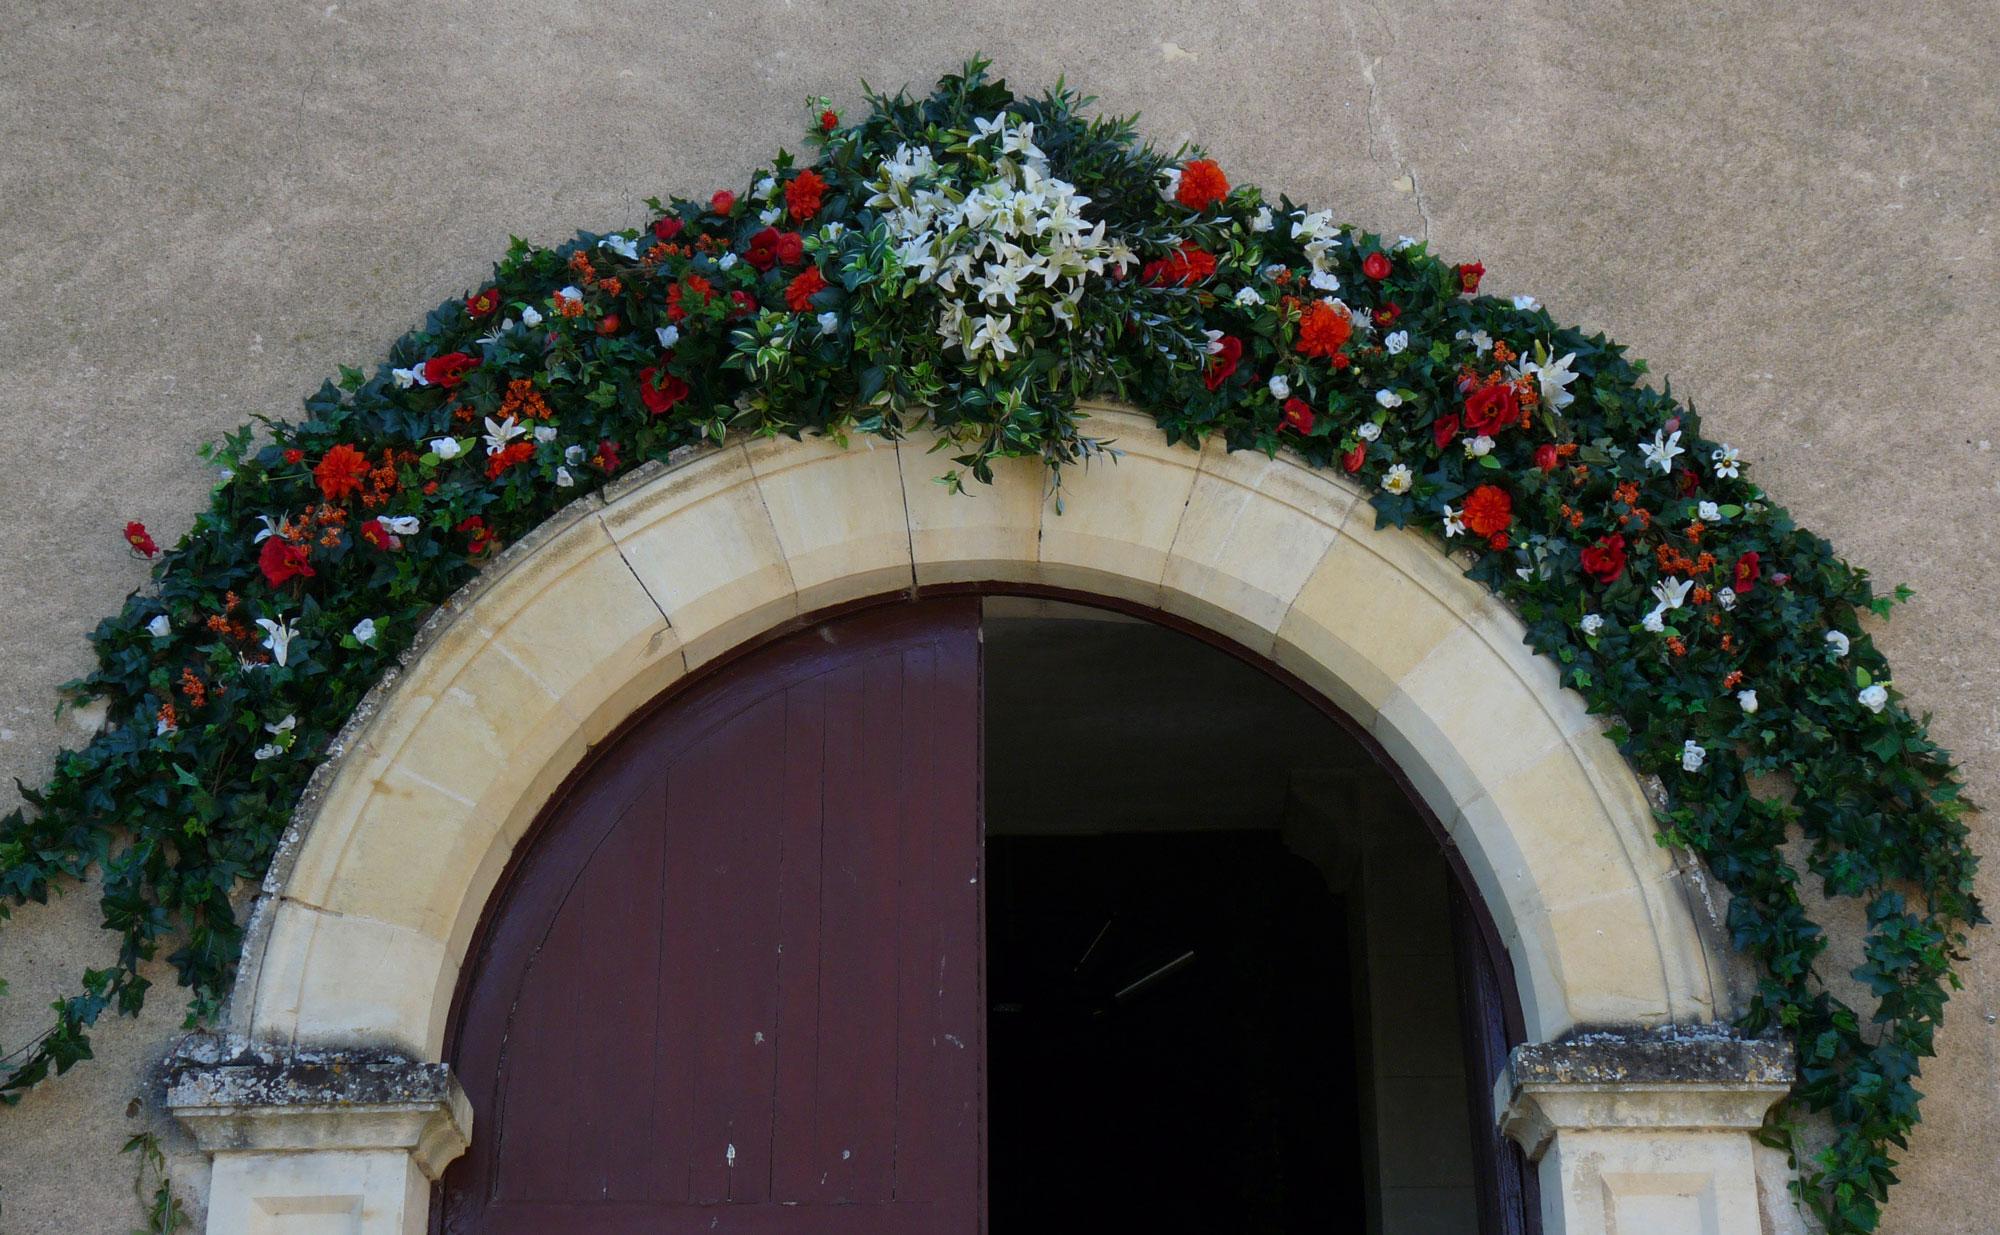 Fronton d'église fleuri